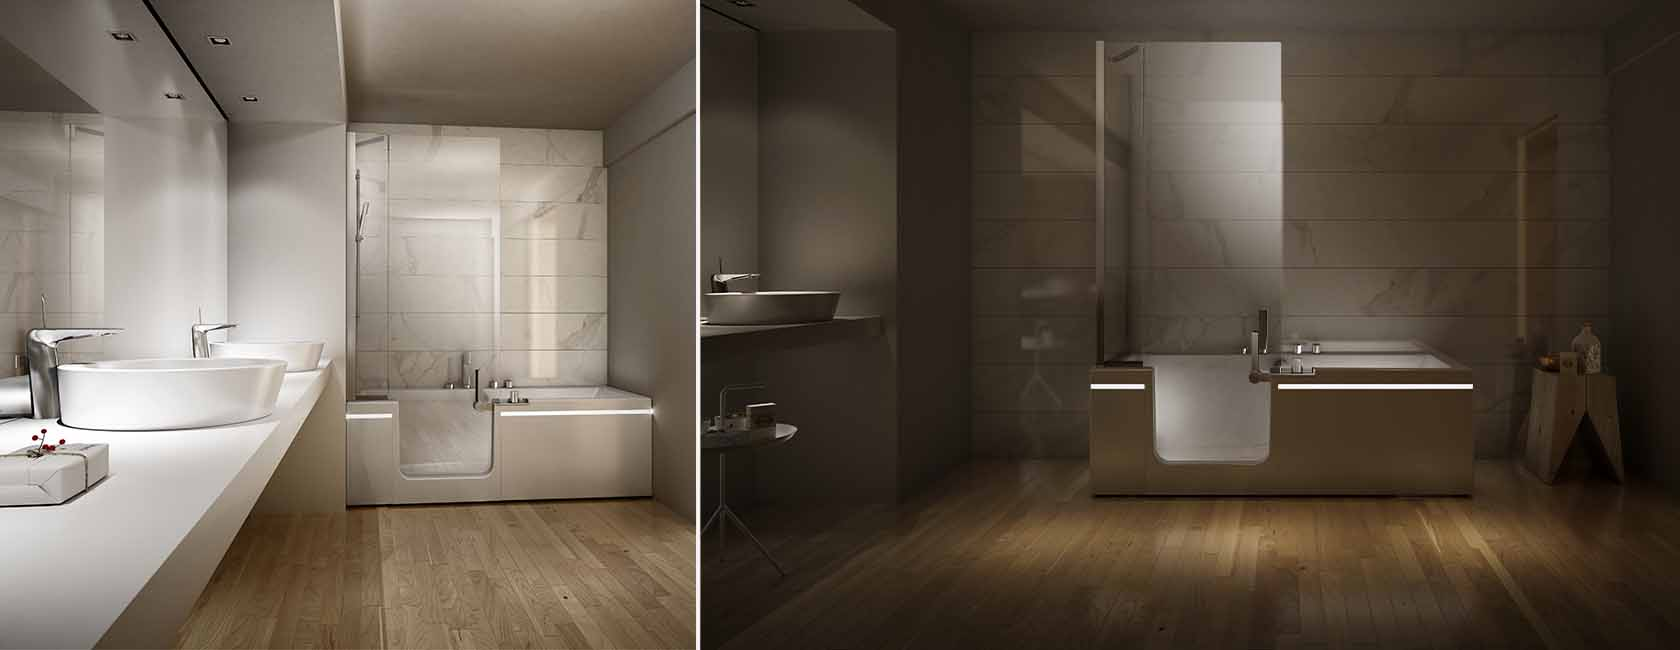 baños para discapactiados minusvalidos, bañeras para minusvalidos